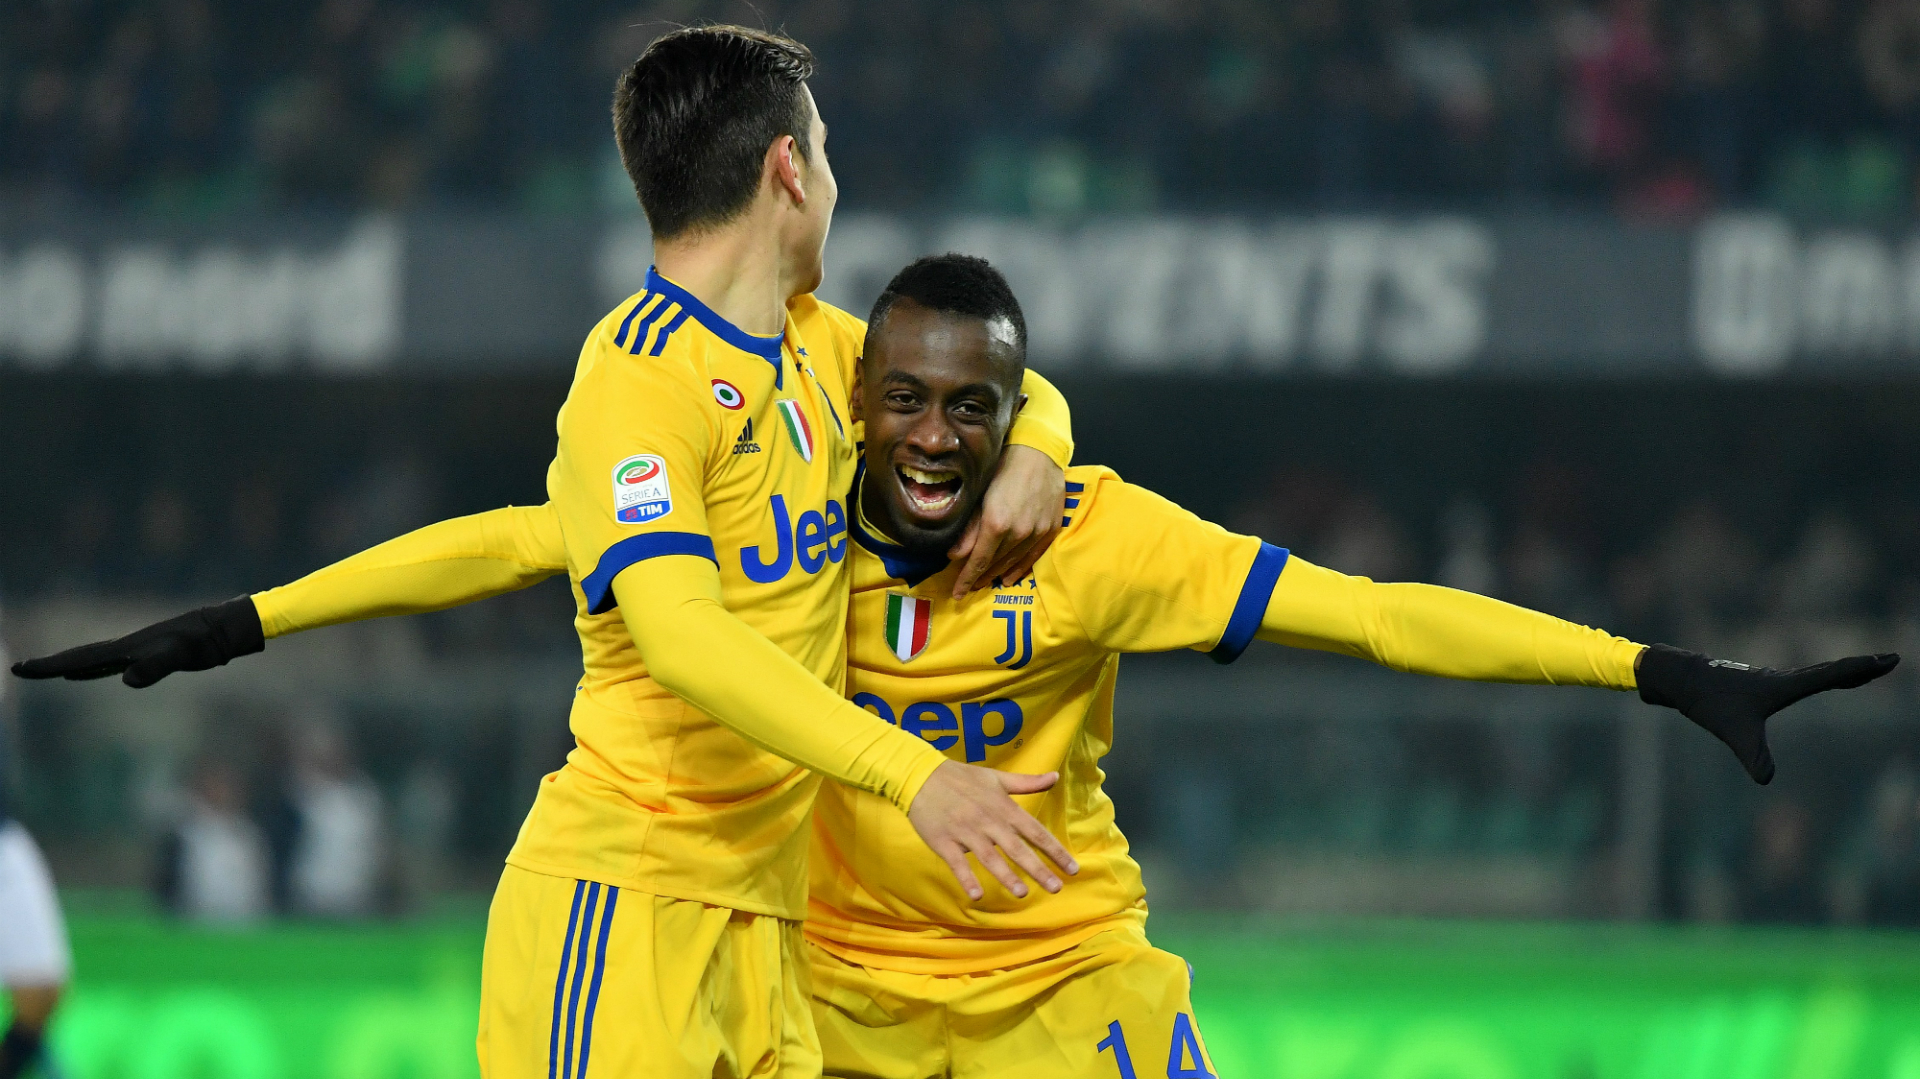 Moviola Juventus-Atalanta: rigore per contatto Mancini-Matuidi